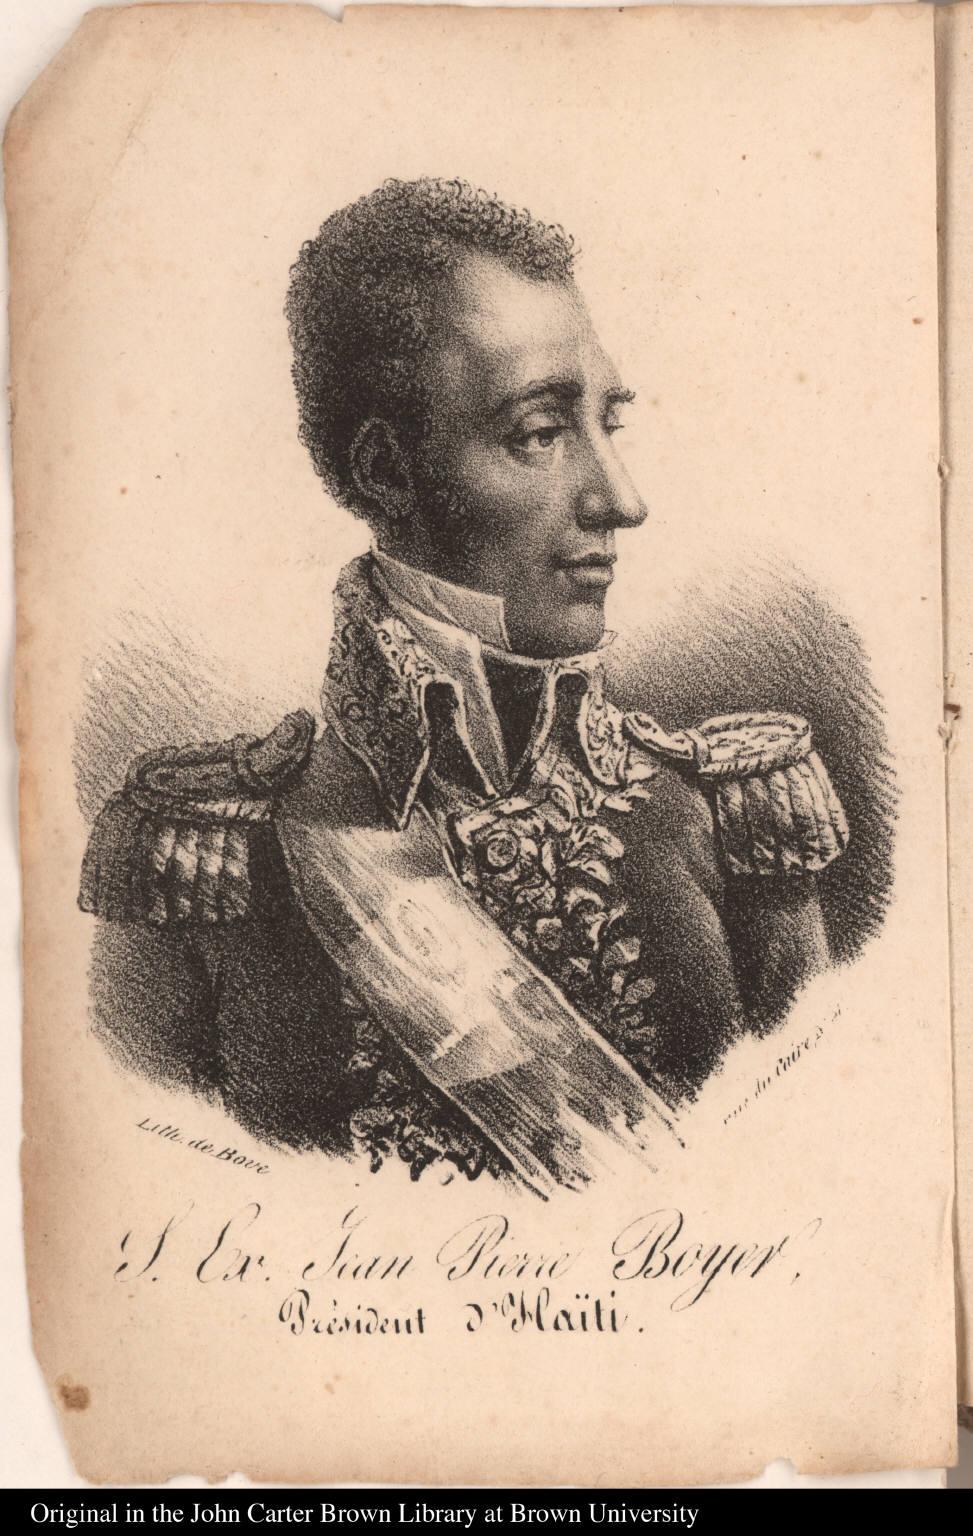 L. Ex. Jean Pierre Boyer. Président d'Haïti. - JCB Archive of ...